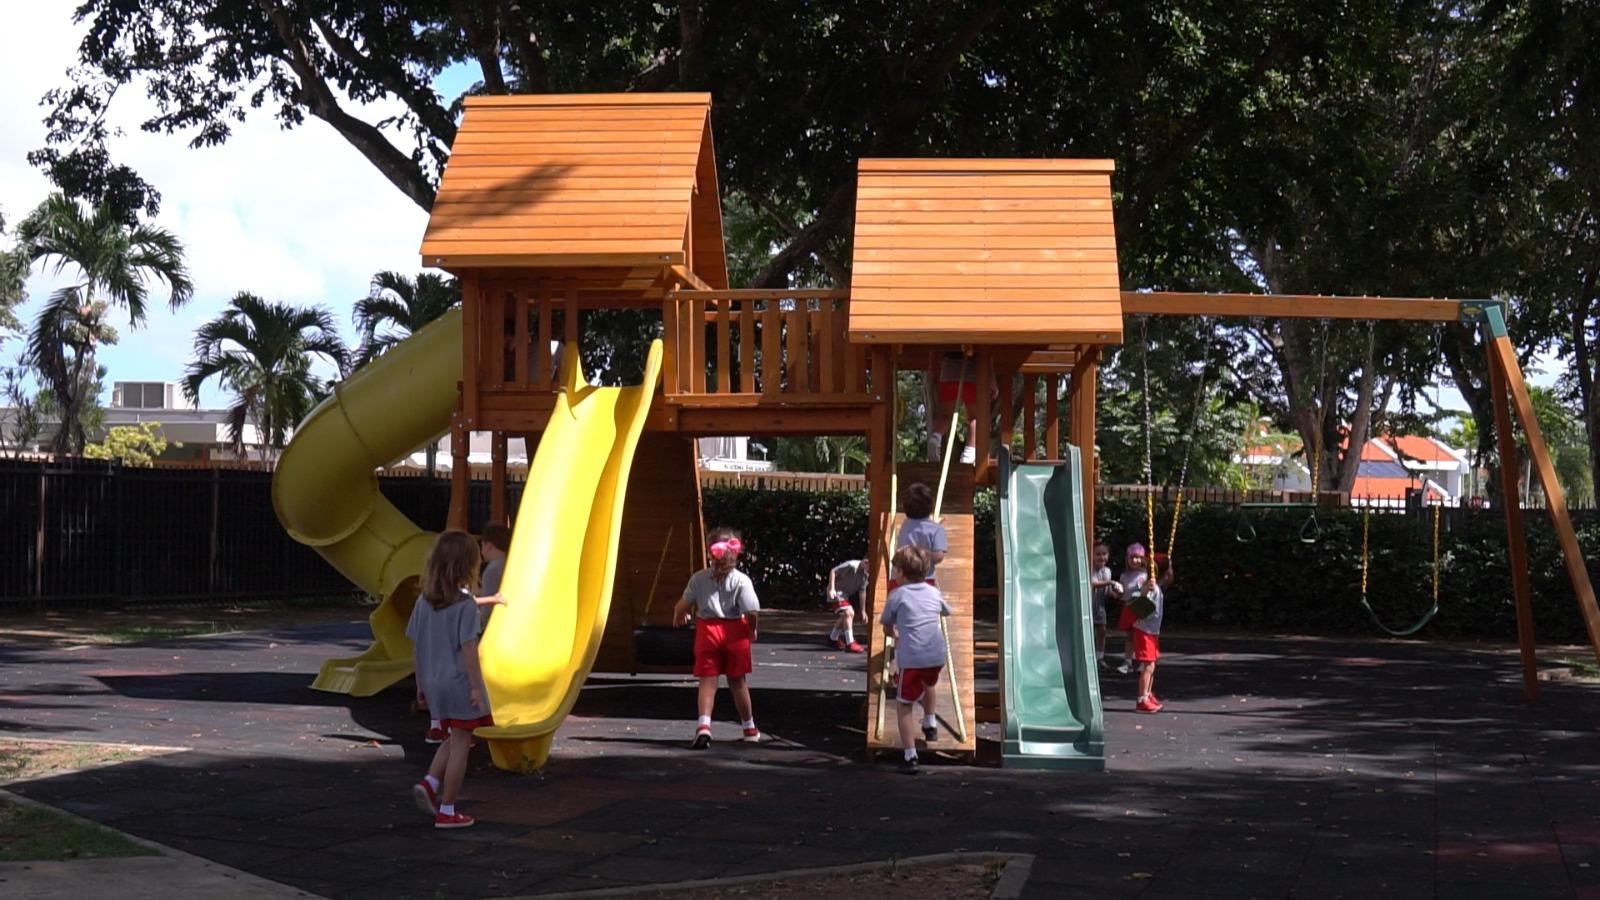 Academia San Ignacio Patio Kinder